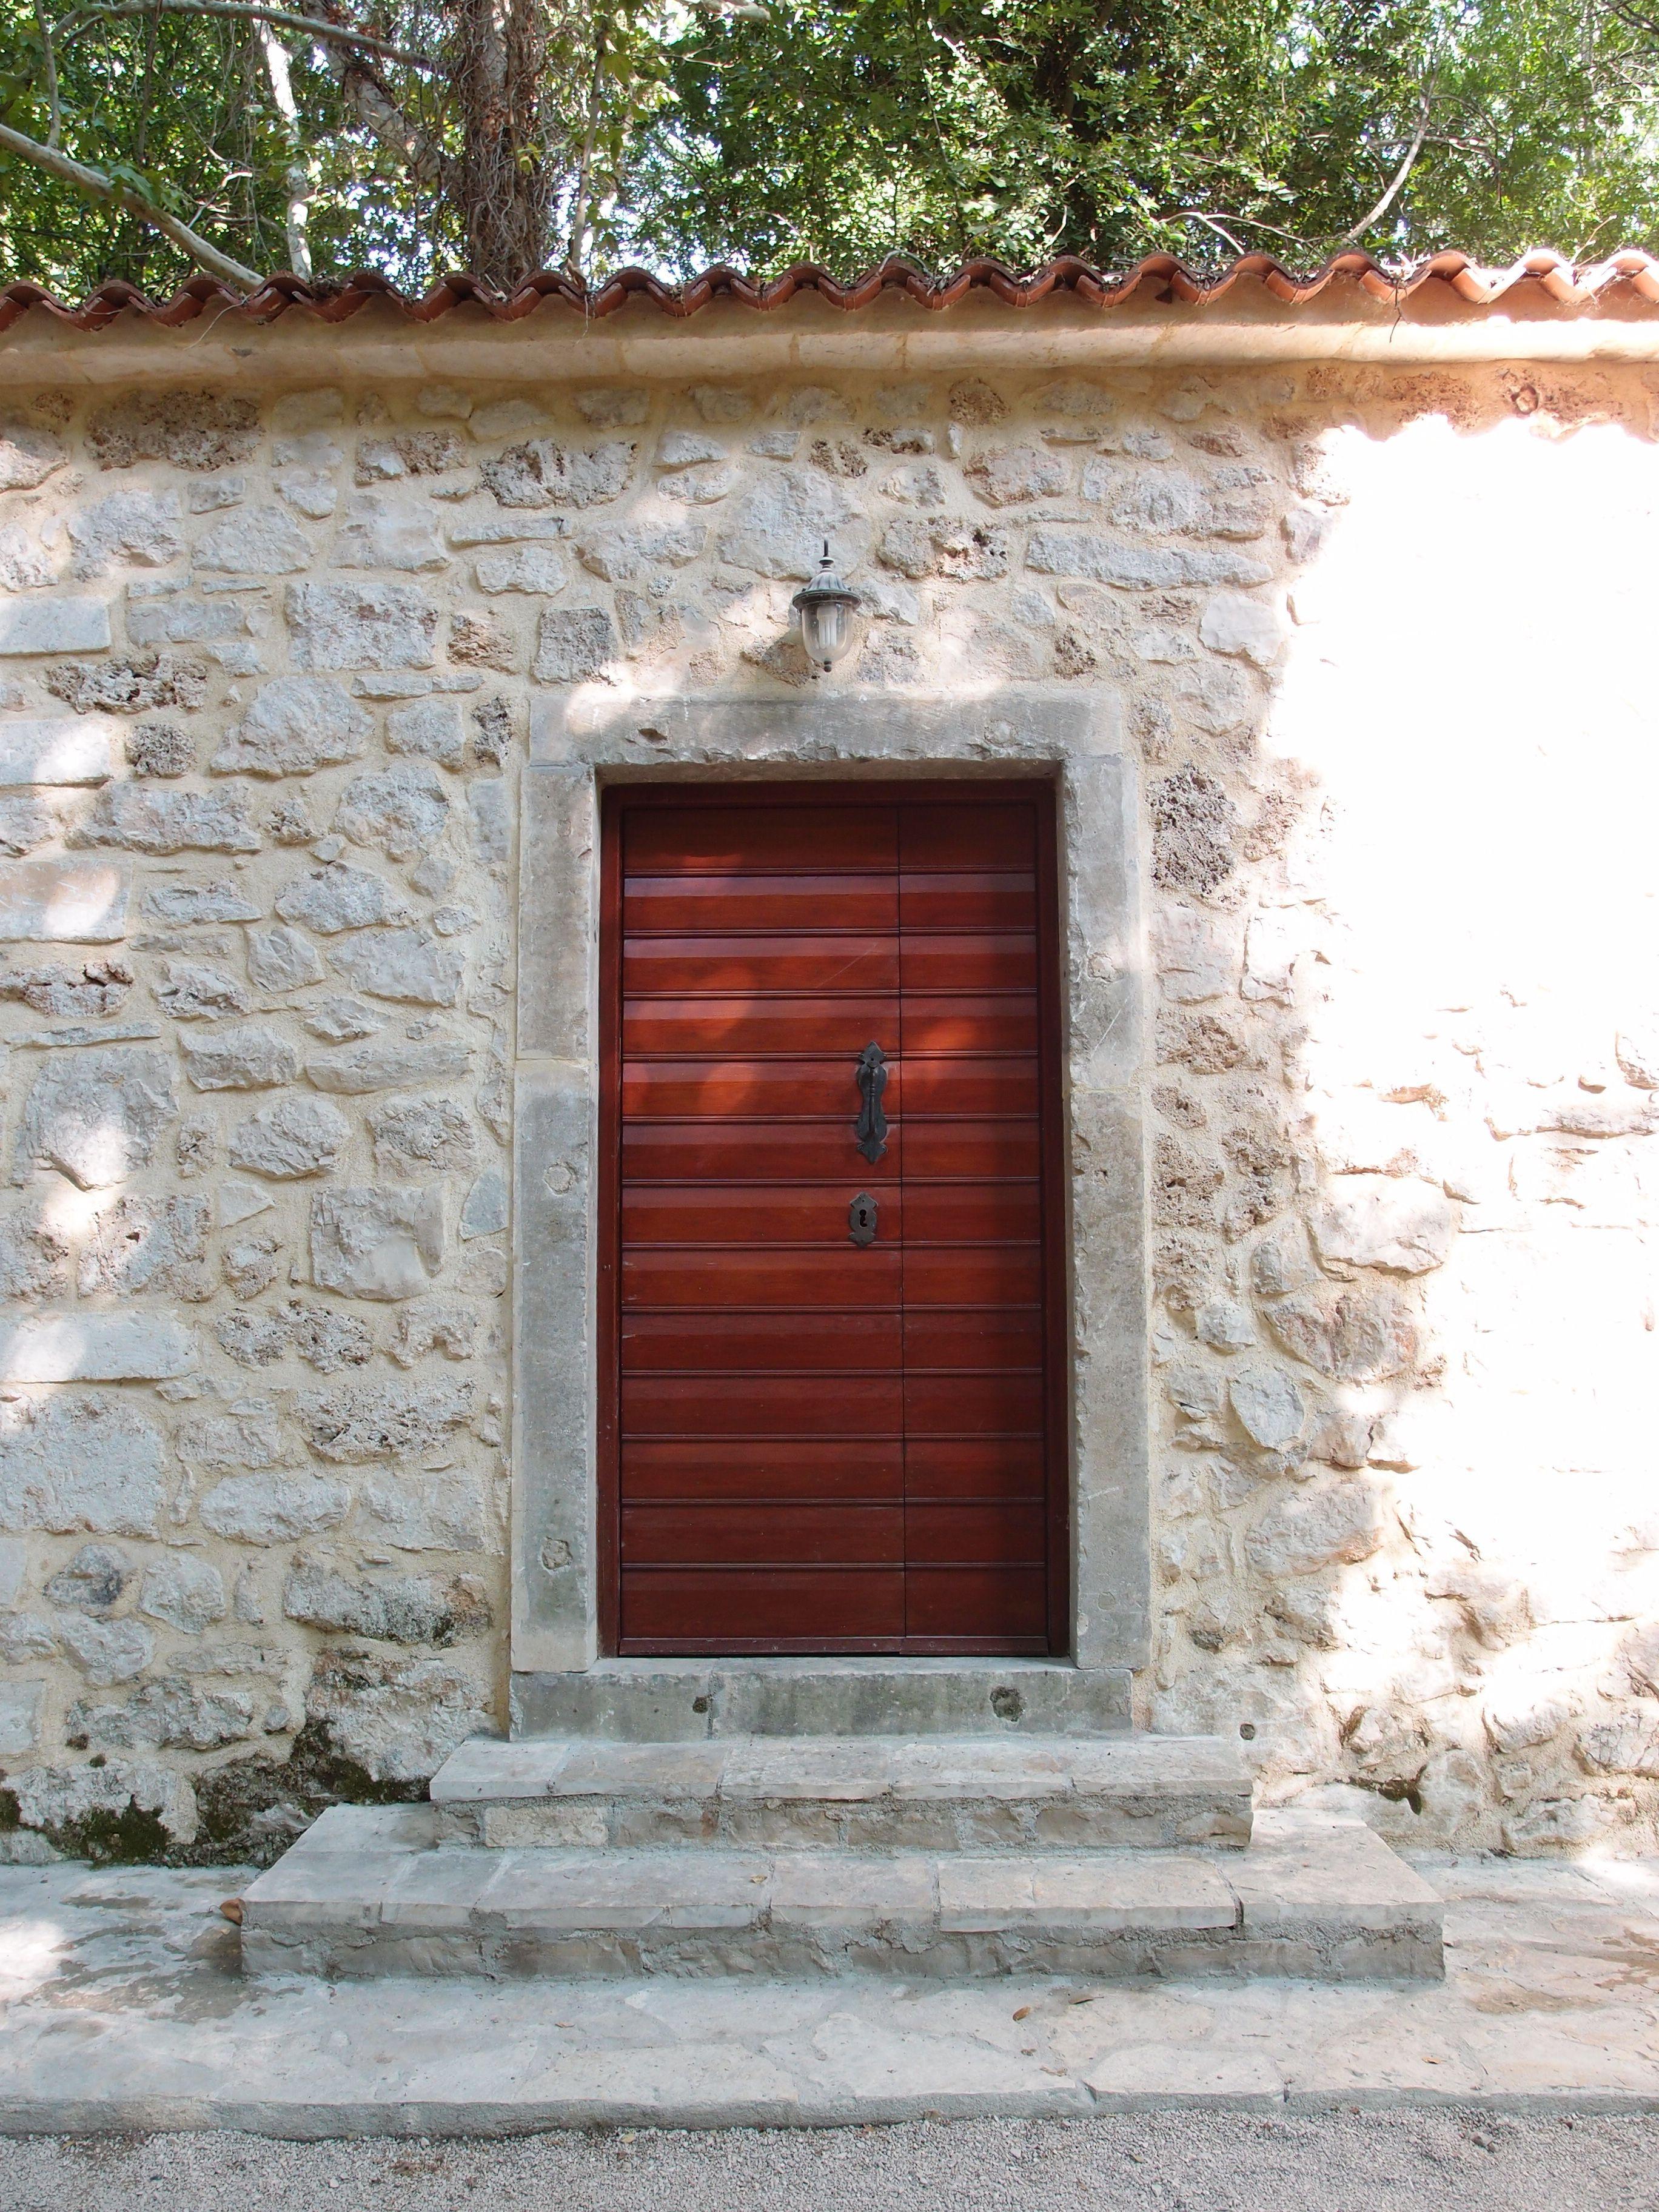 Red Wooden Door In Eastern Europe Photographed By Marleen Van